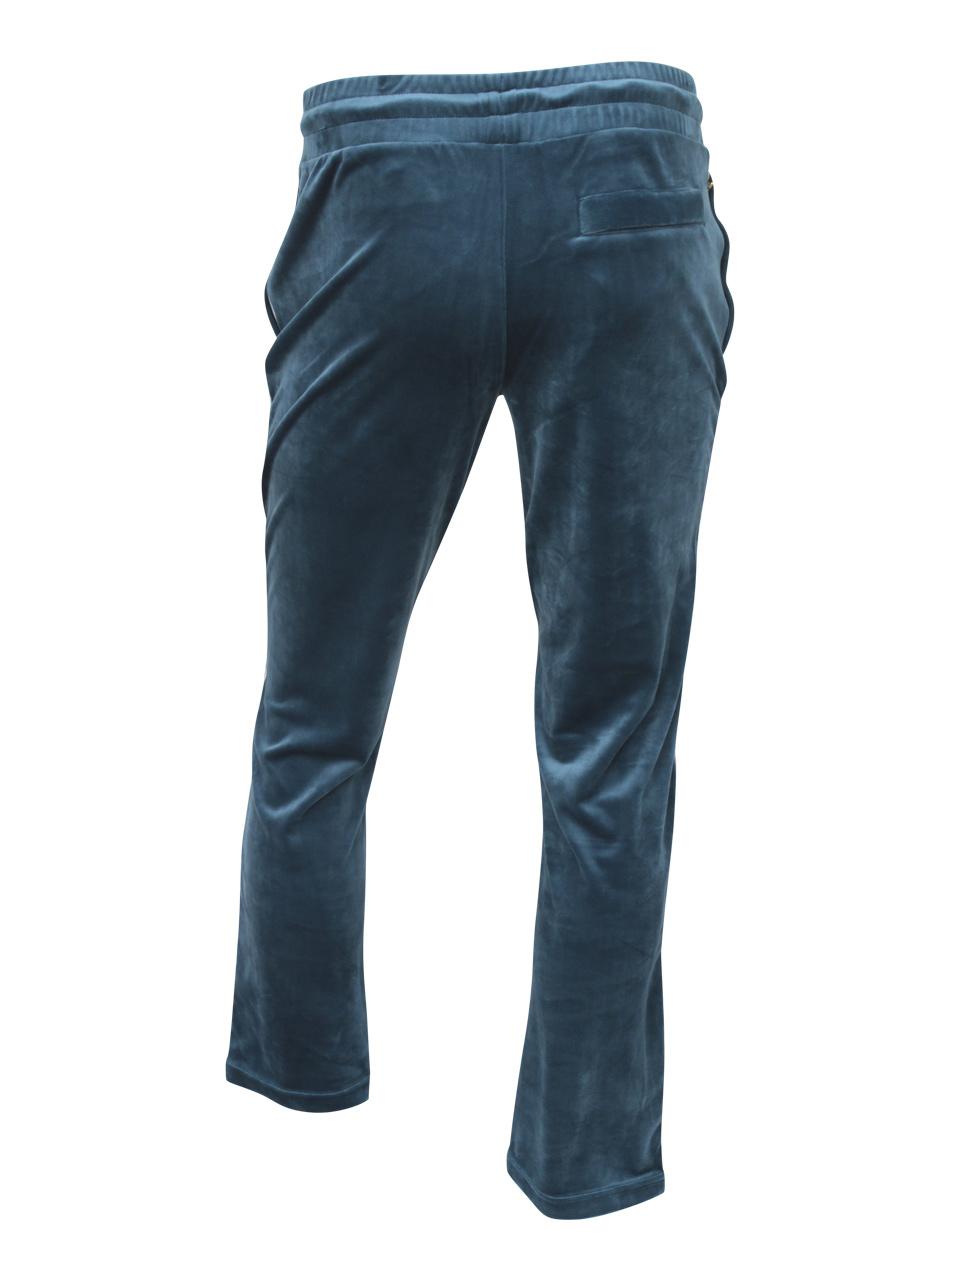 Blue Fila Men/'s Molveno Slim Fit Joggers